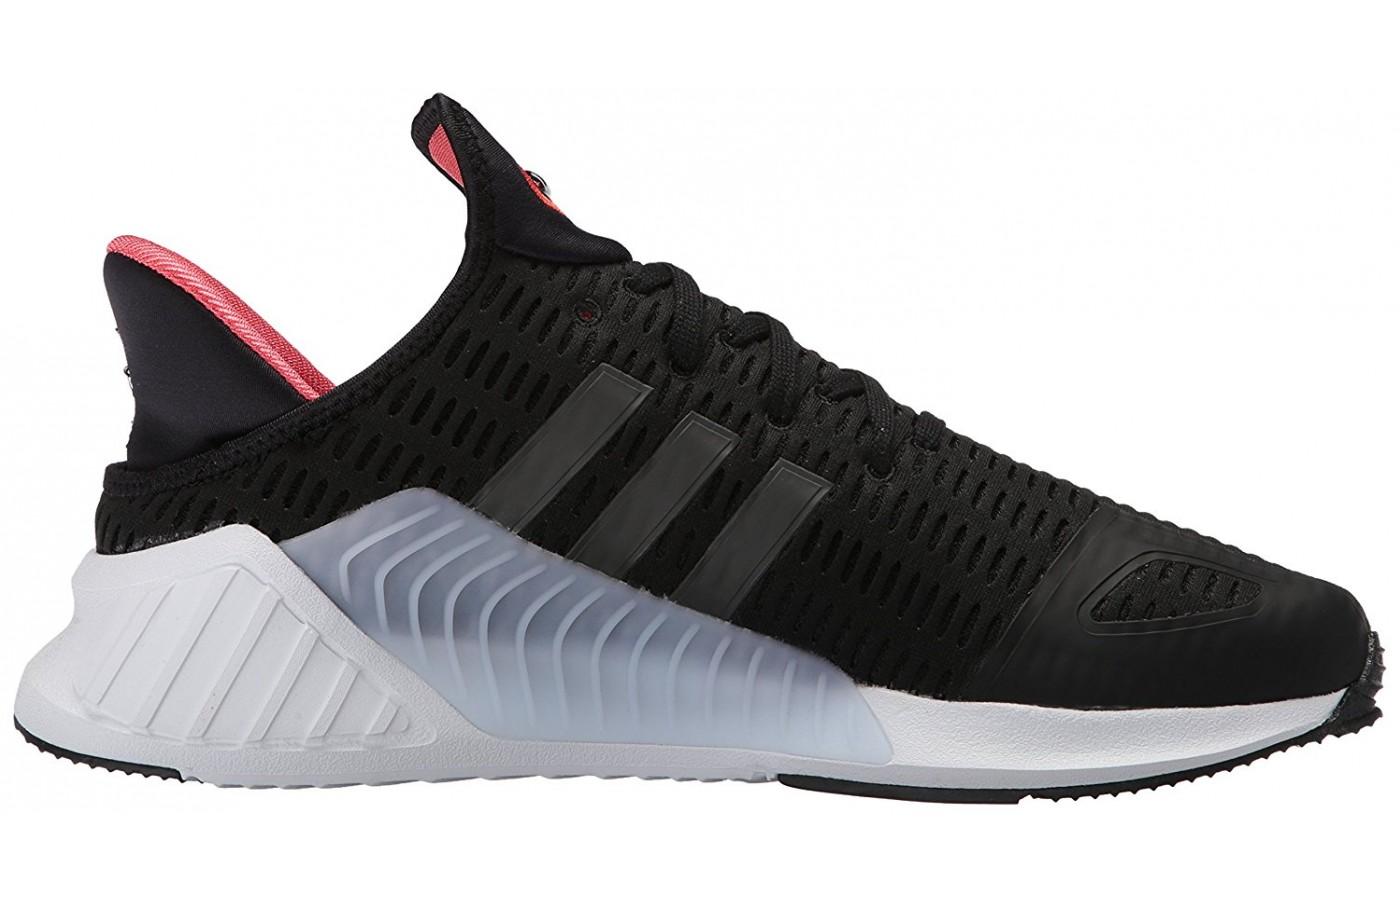 Adidas Running Shoes 2017